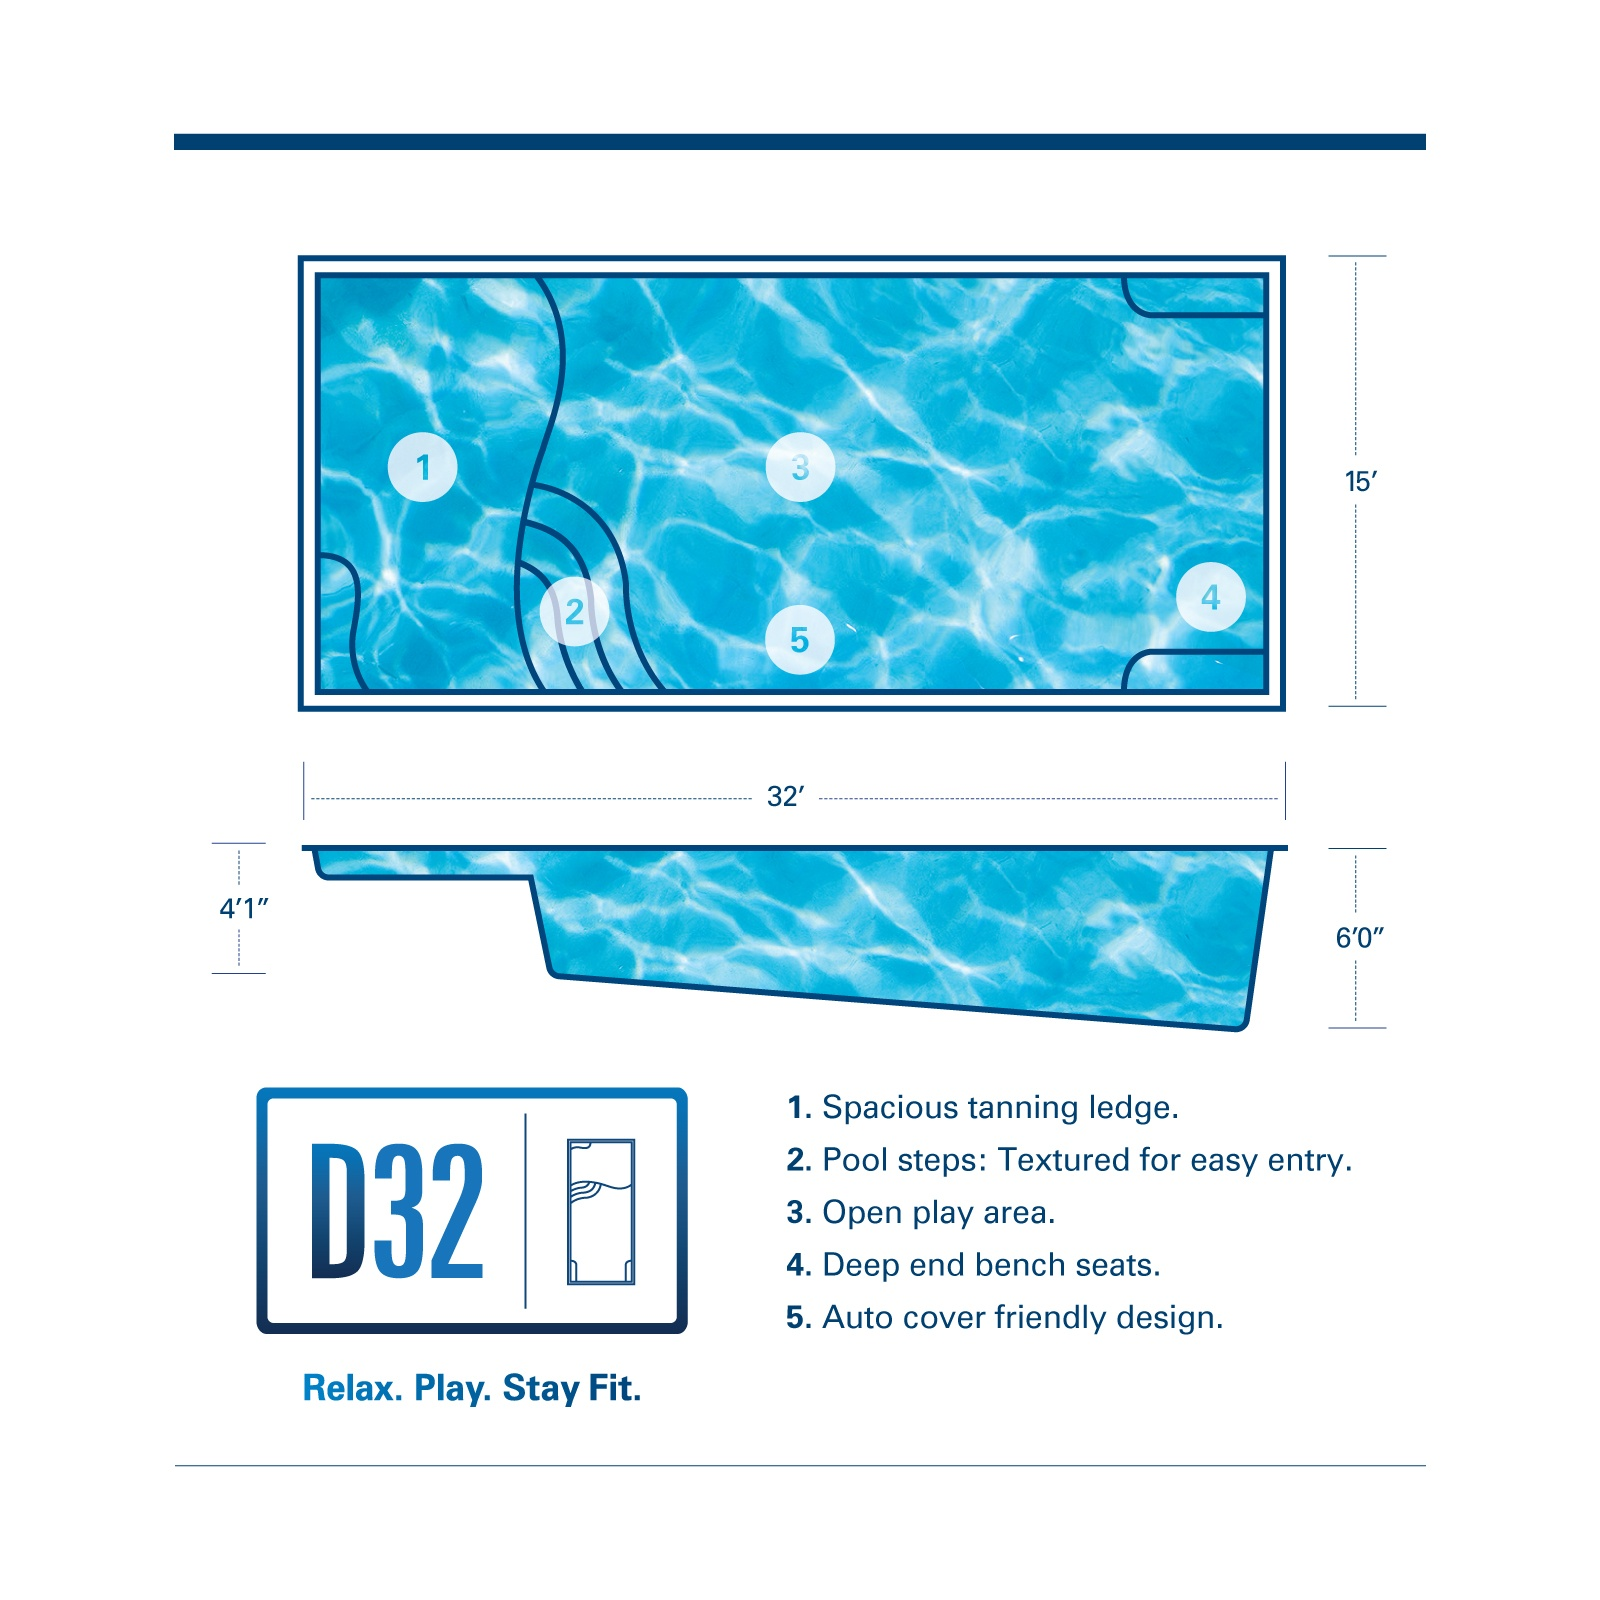 rectangular Del Sol 32 pool design by River Pools